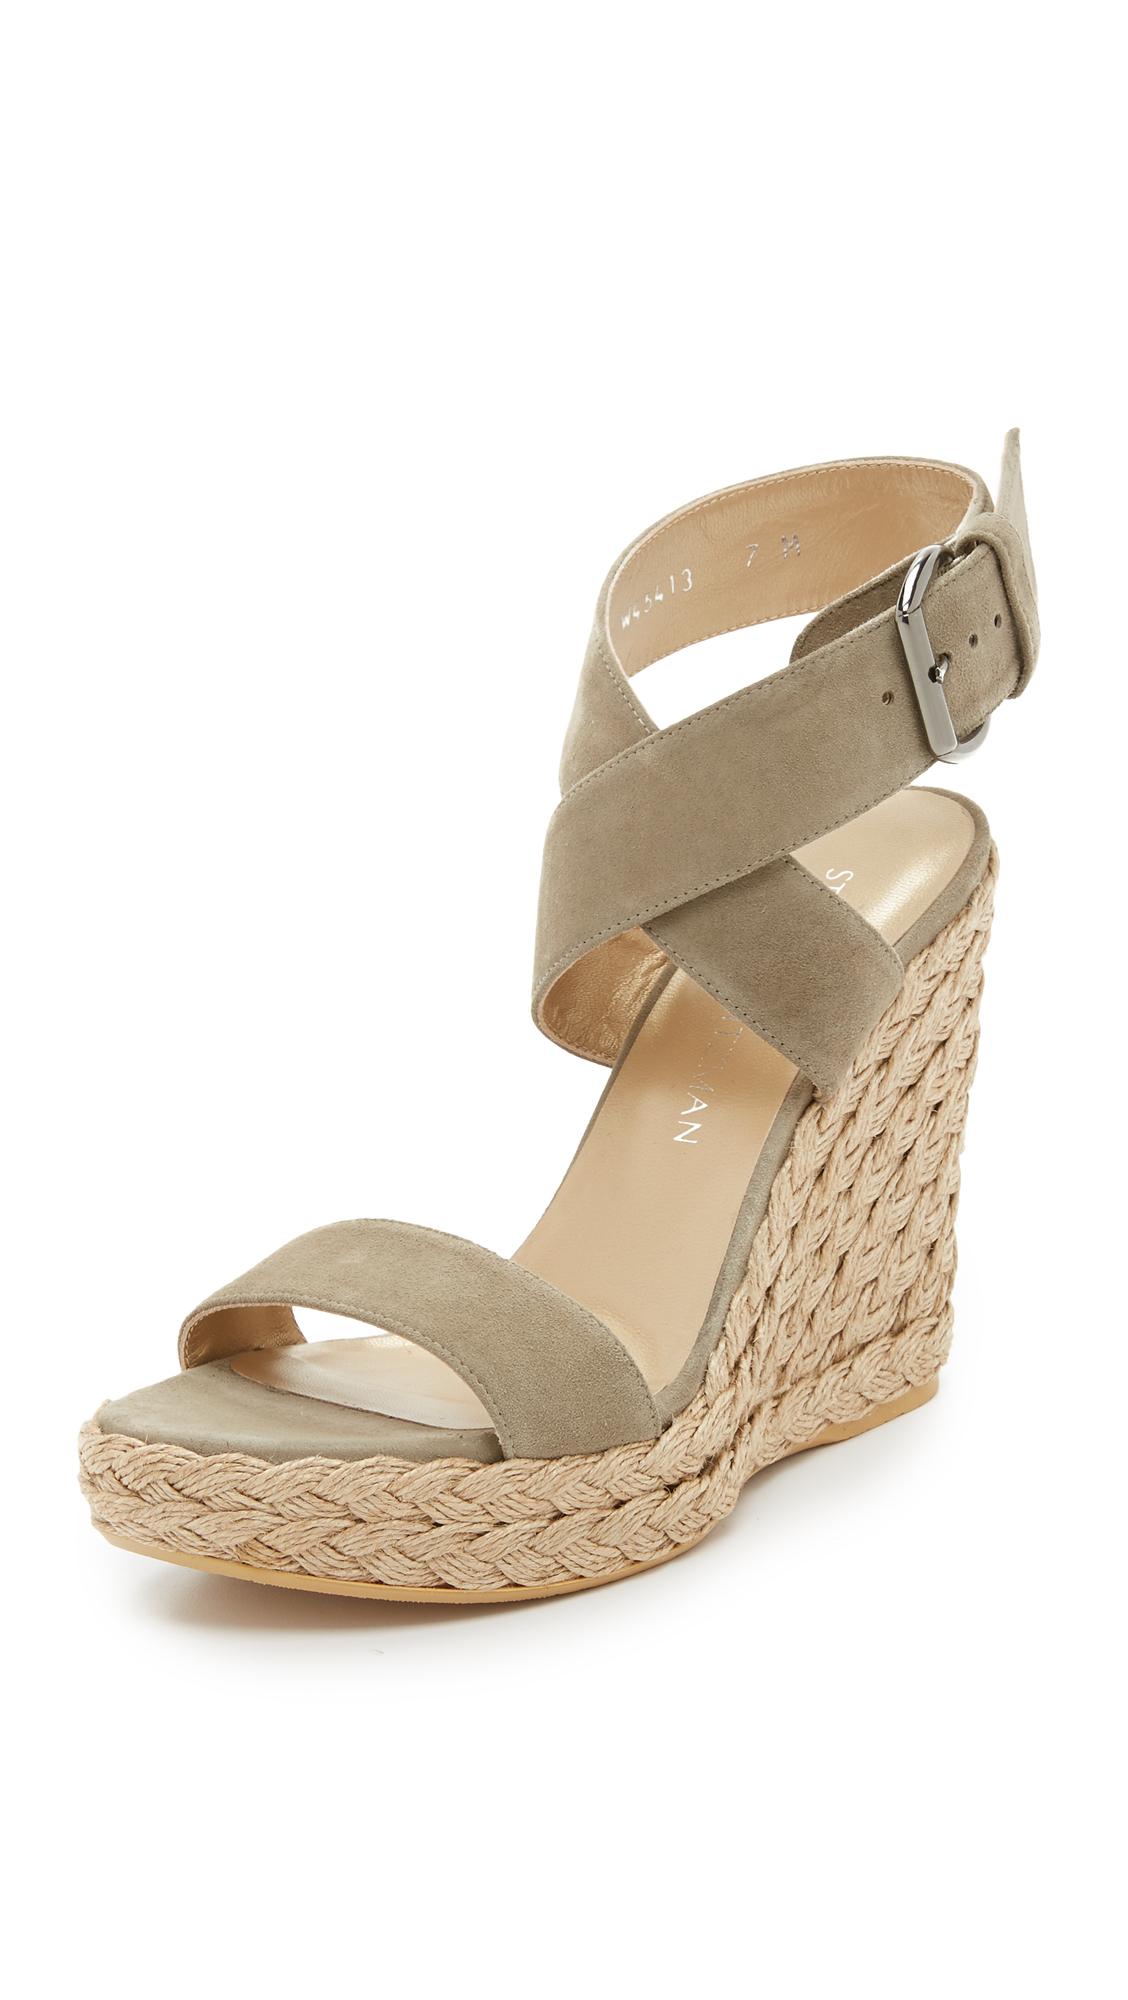 stuart weitzman x wedge sandals in lyst